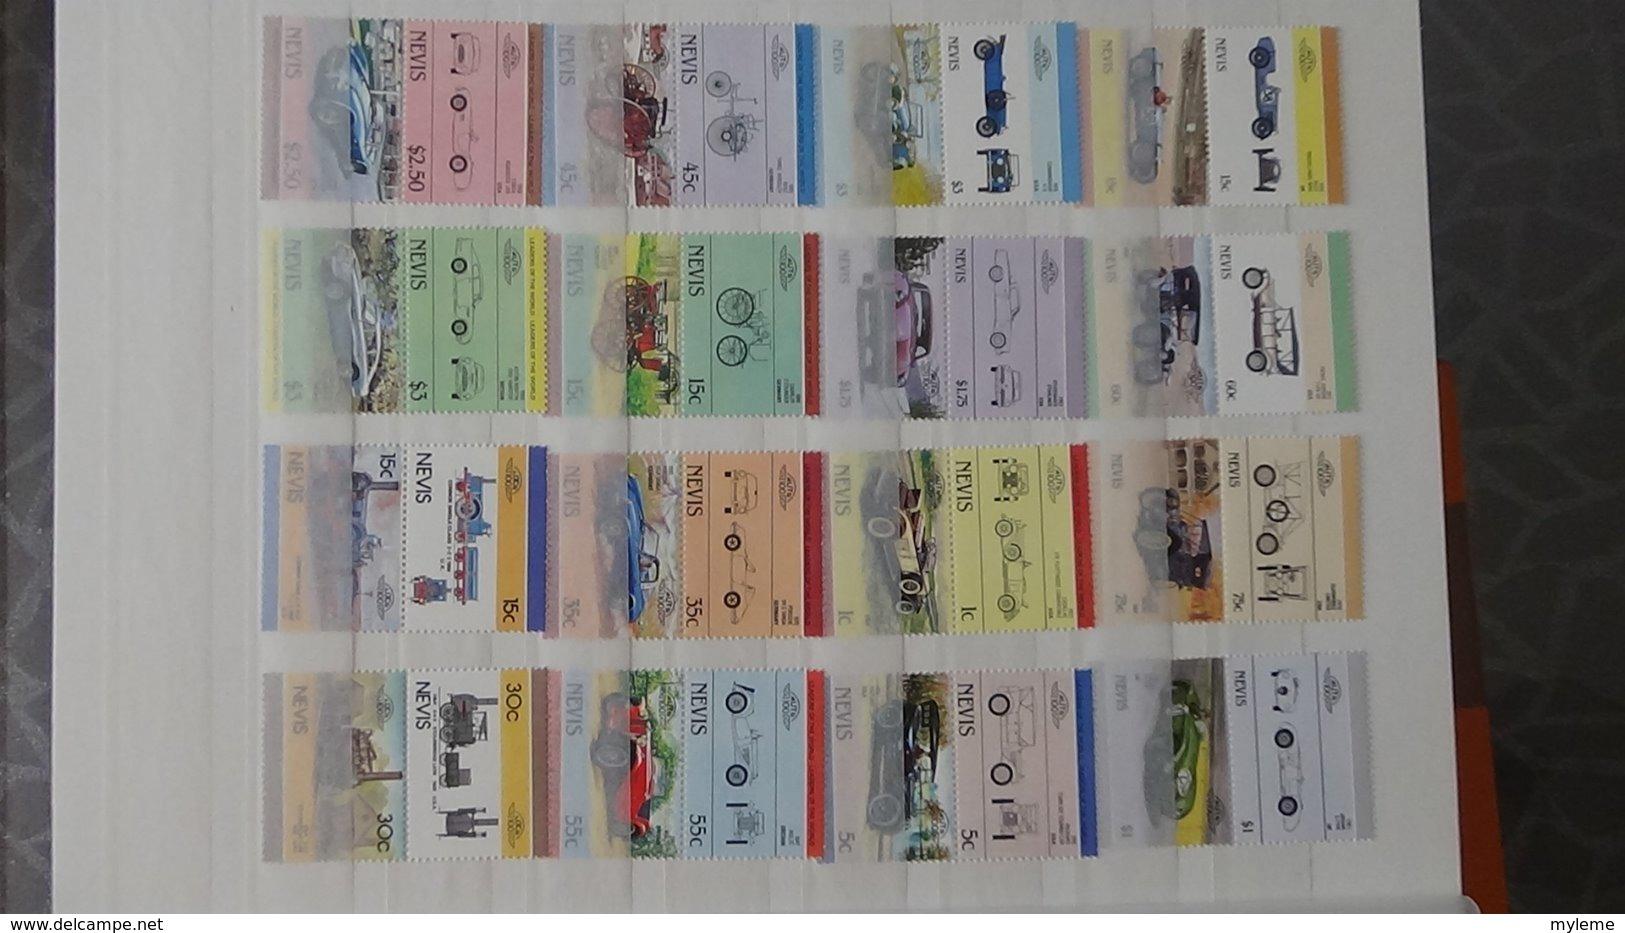 Plus De 140 Blocs, Bandes, Carnets ** + Timbres De Différents Pays. A Saisir !!! - Postzegels